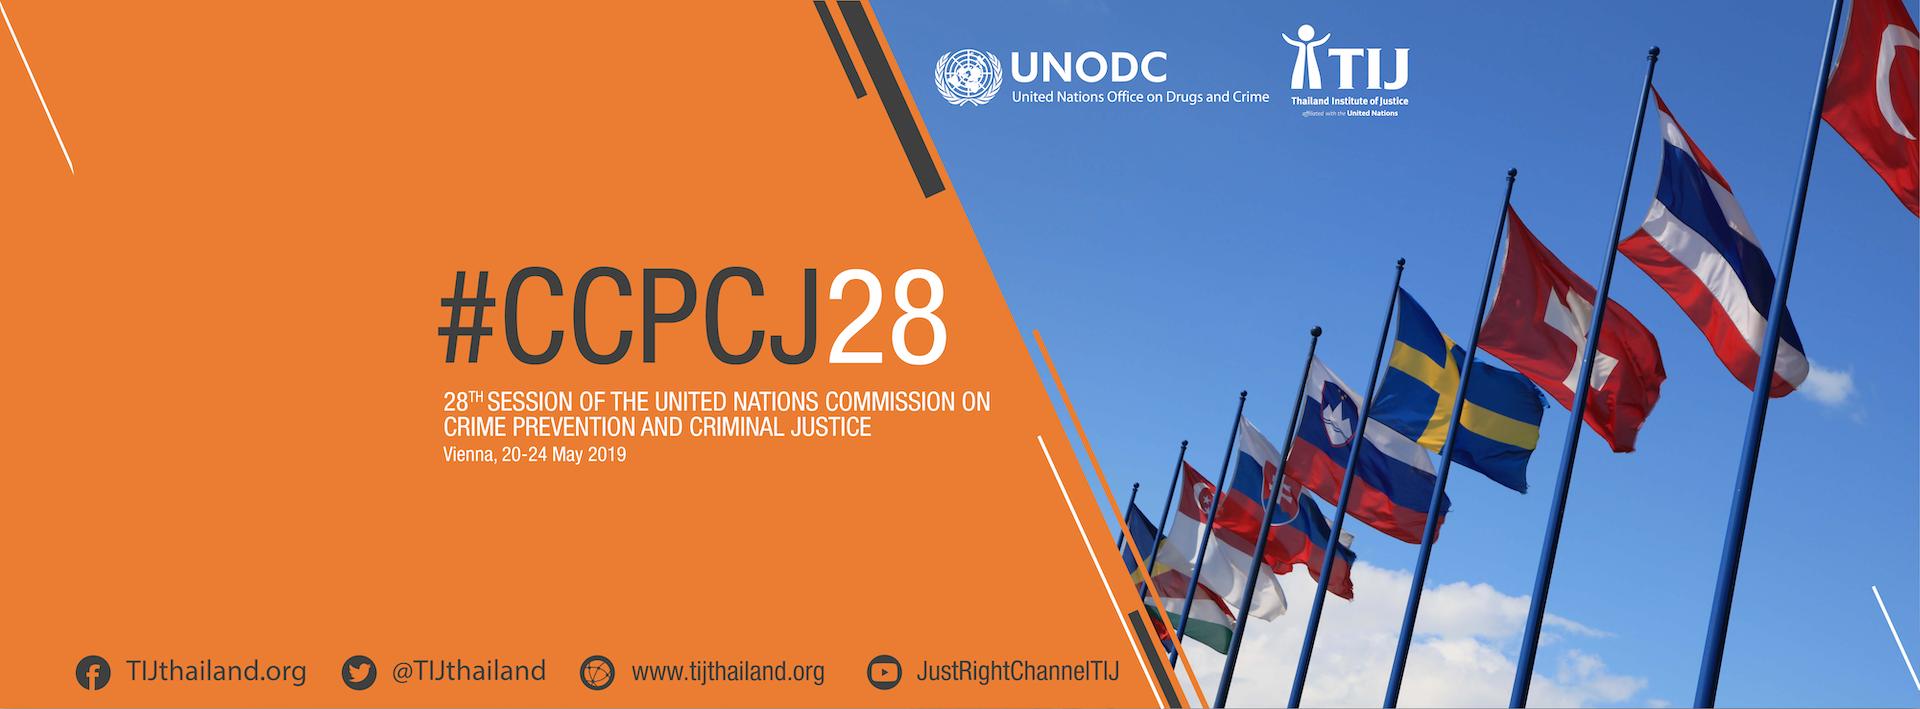 CCPCJ28